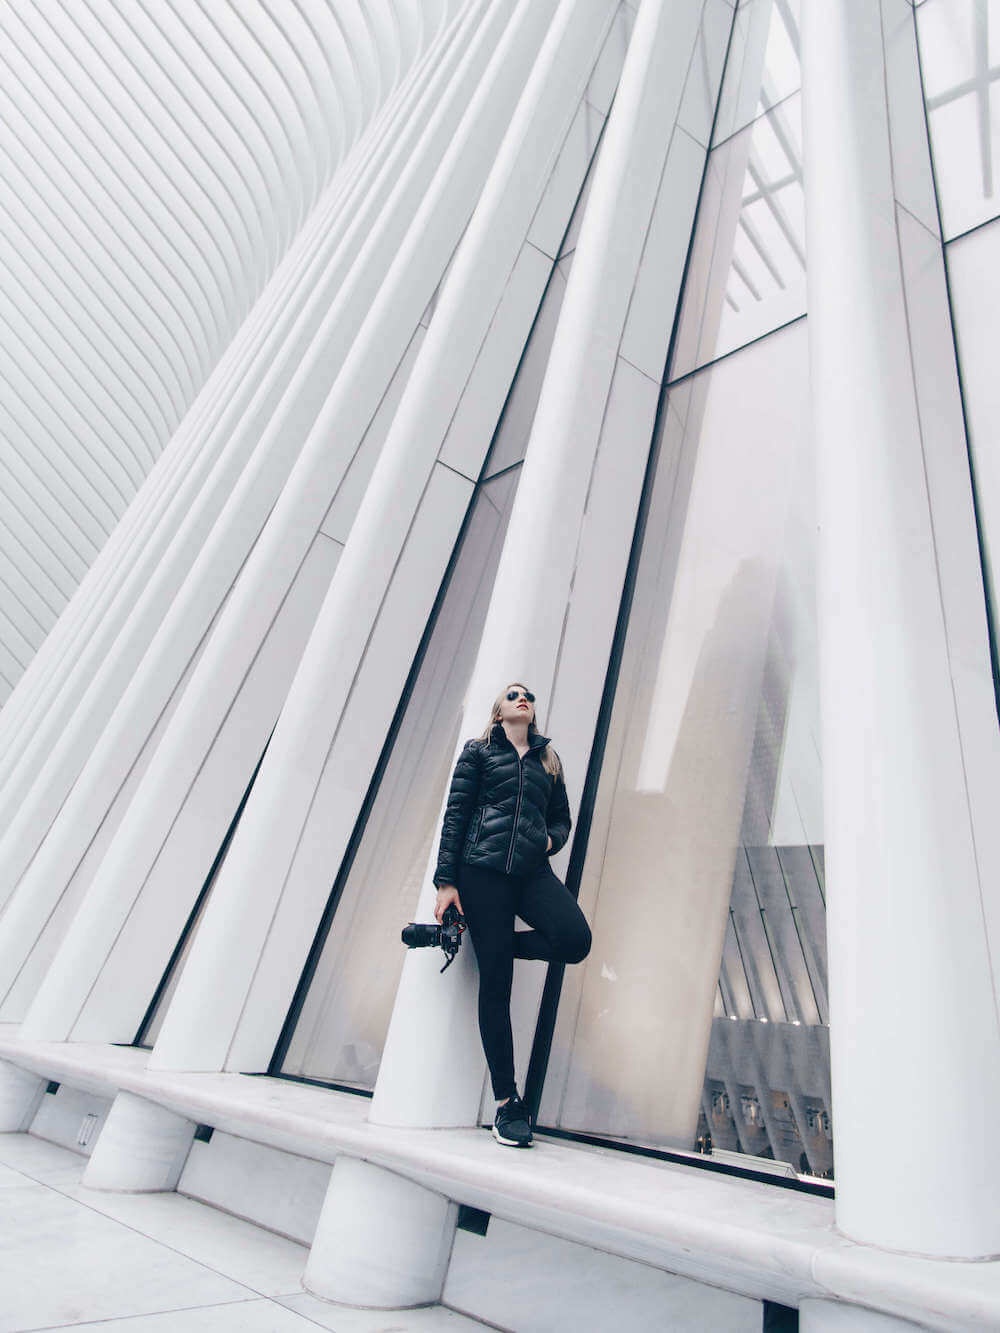 oculus new york city photography